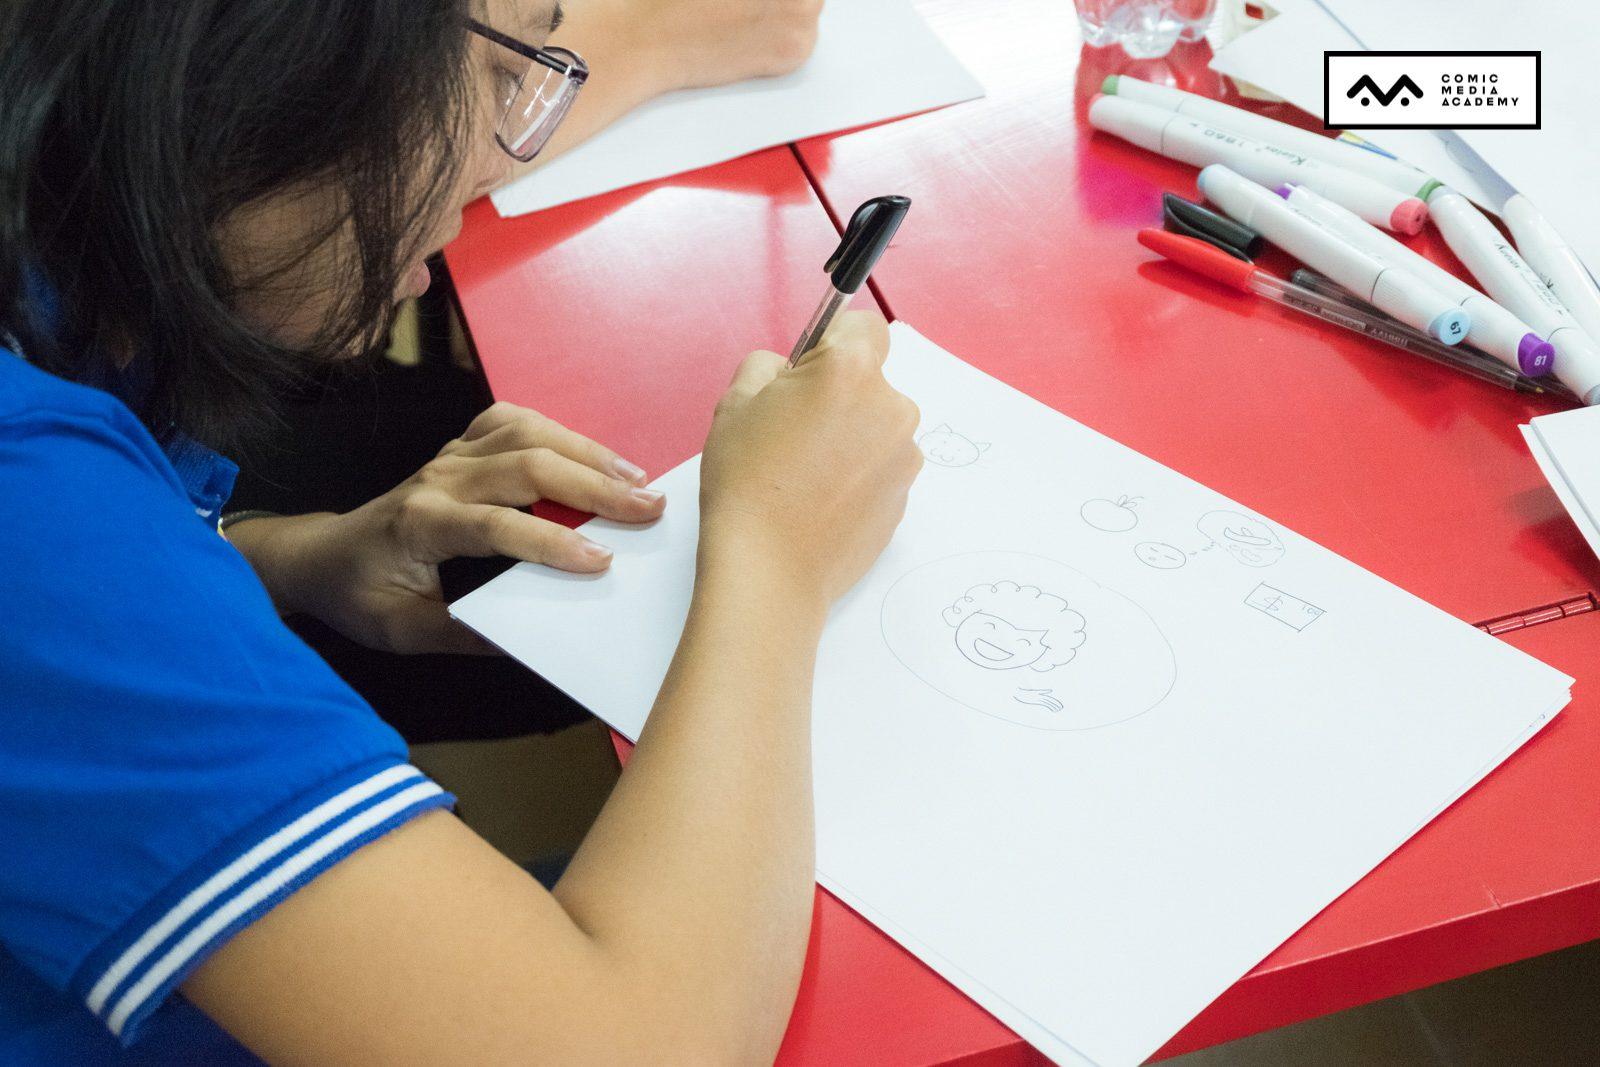 sketchnote cho học sinh